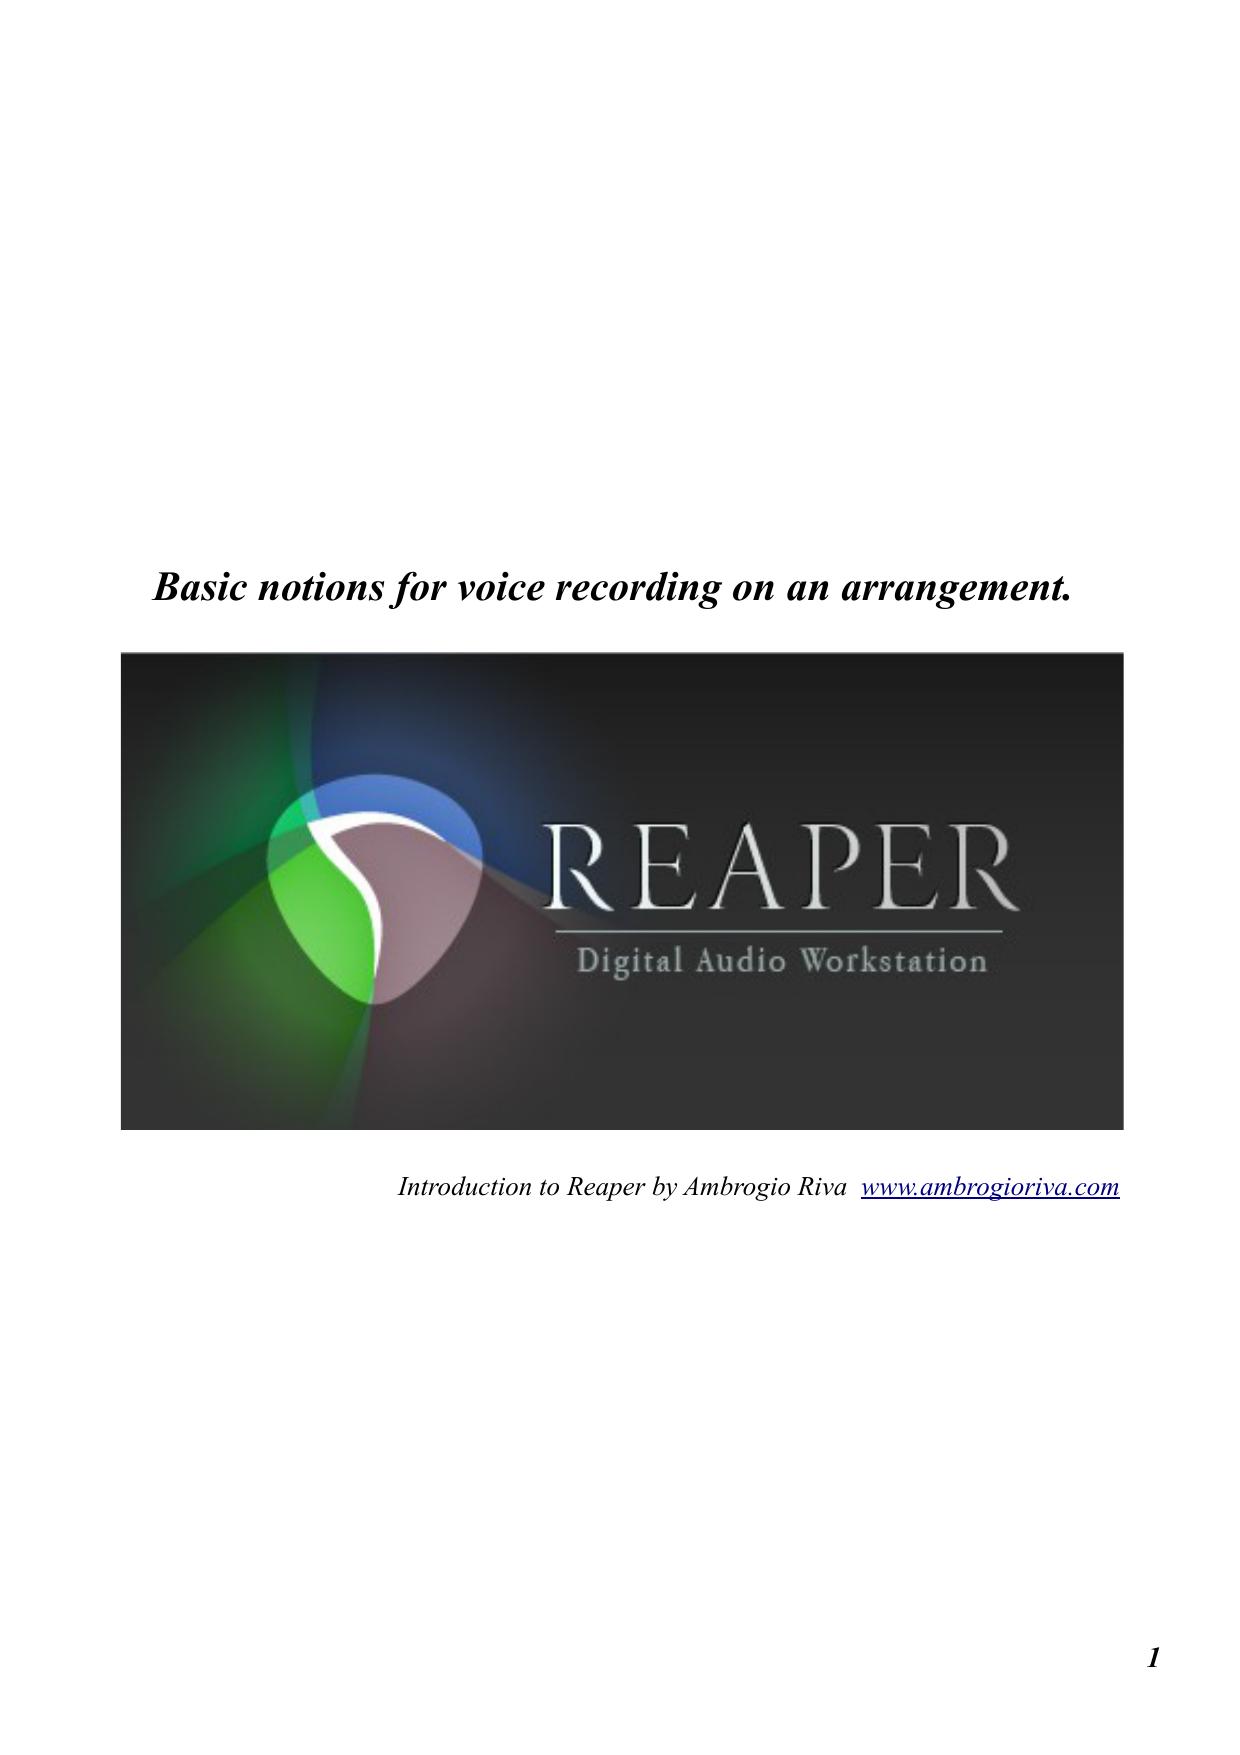 voice recording [PDF 2,7 MB] | manualzz com